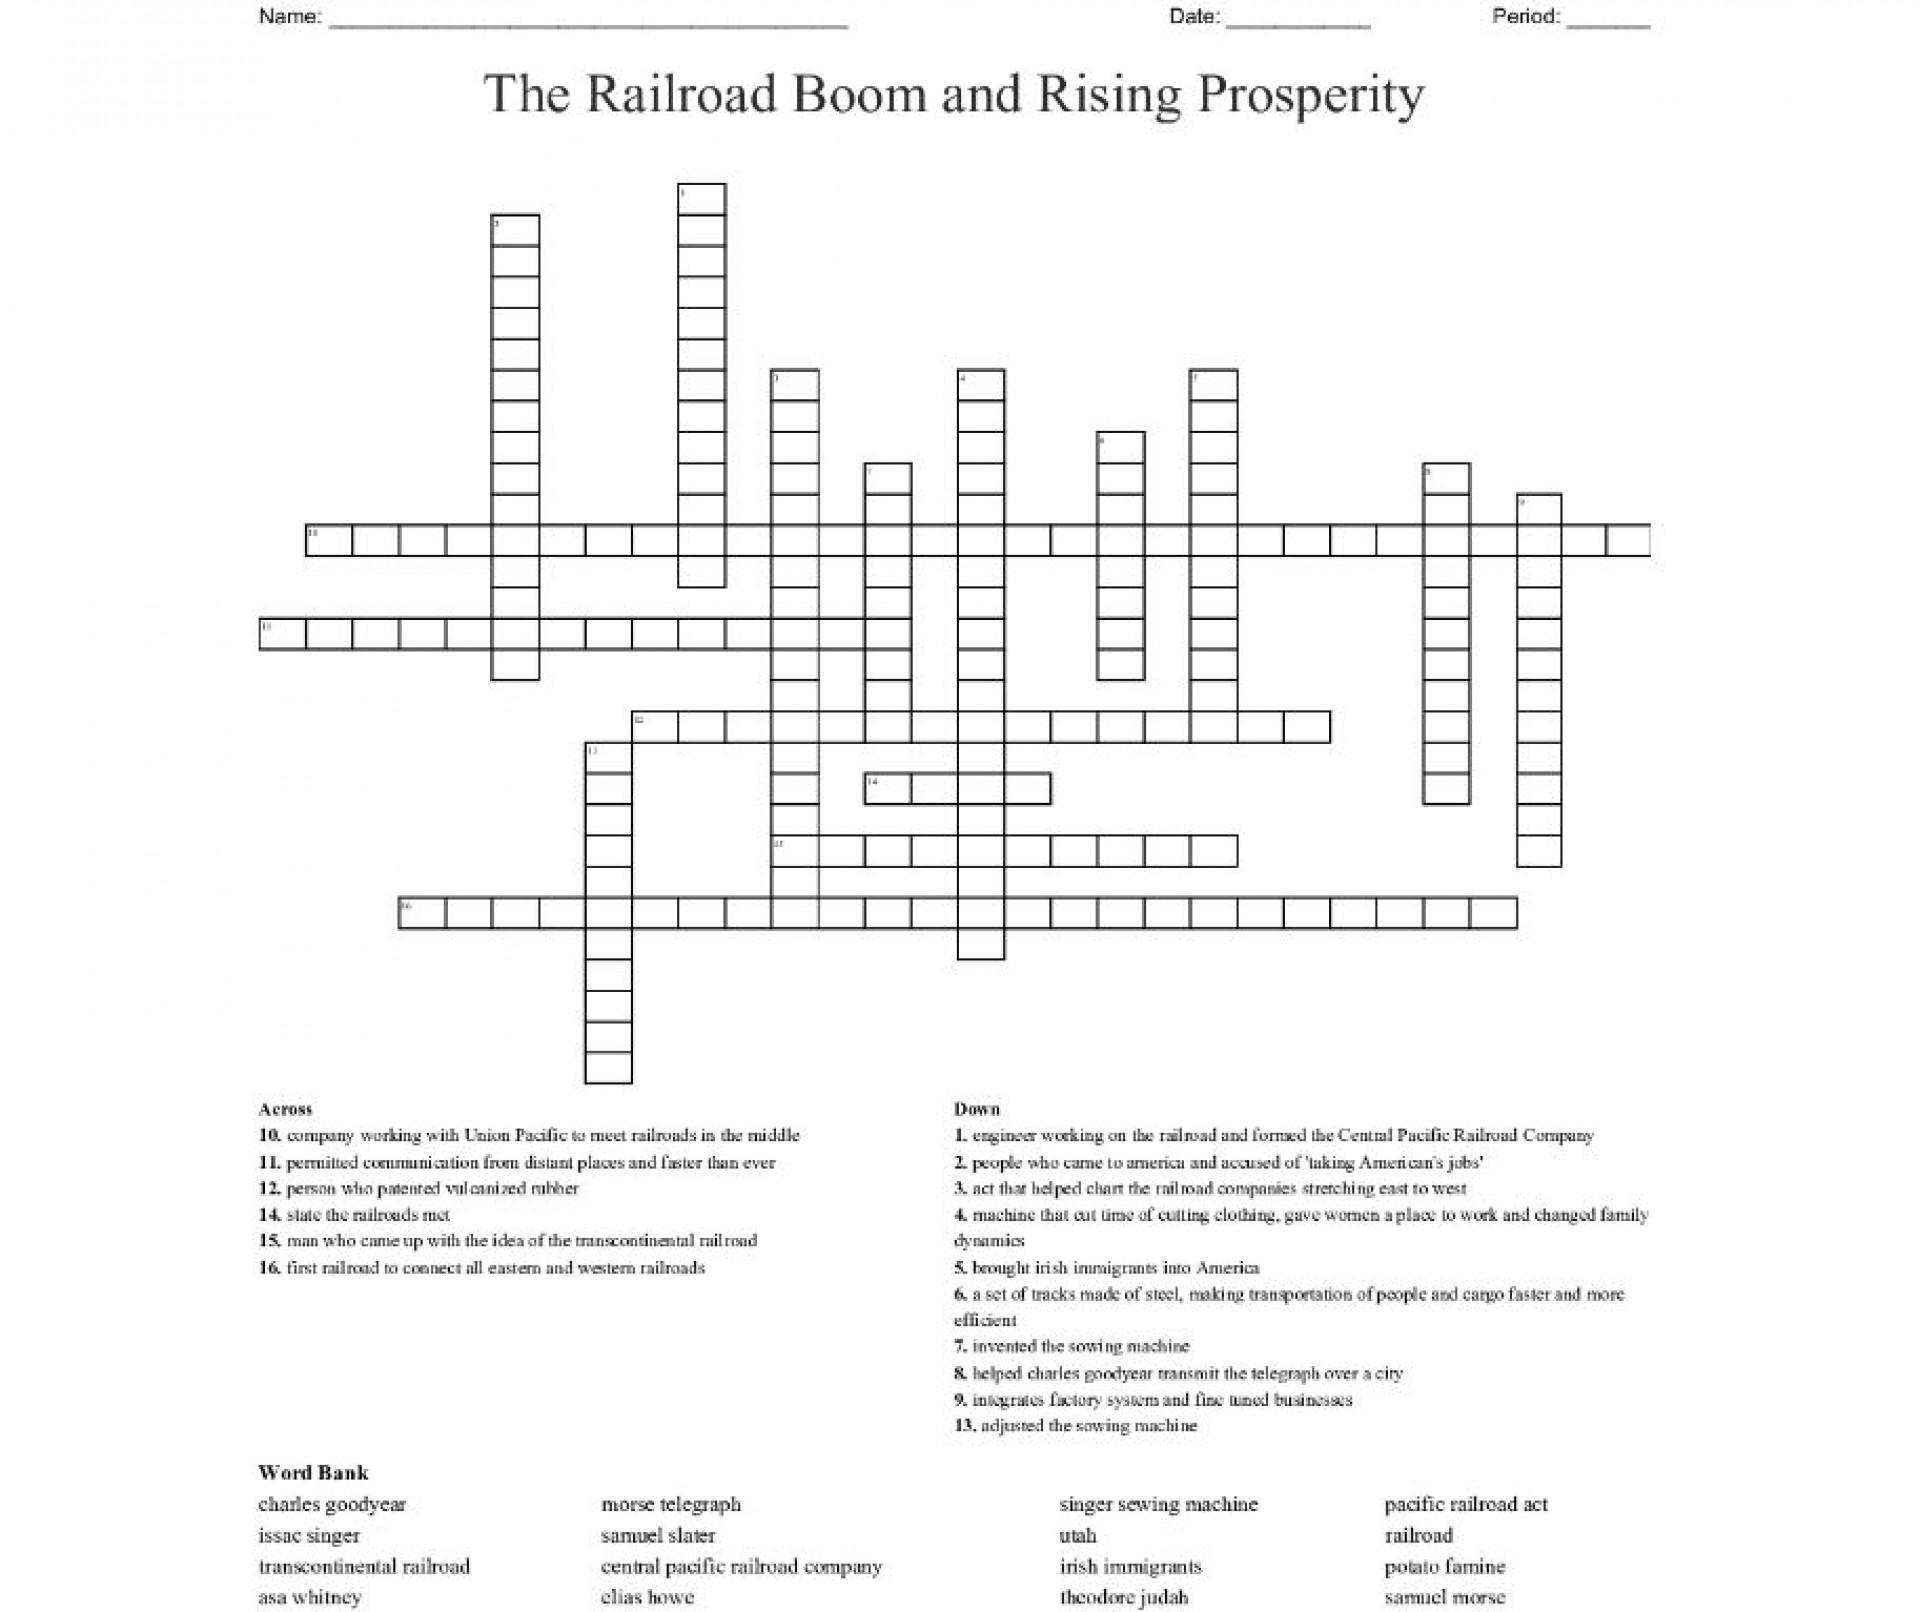 004 Unusual Prosperity Crossword Sample  Clue 6 Letter Material Prosperou 41920